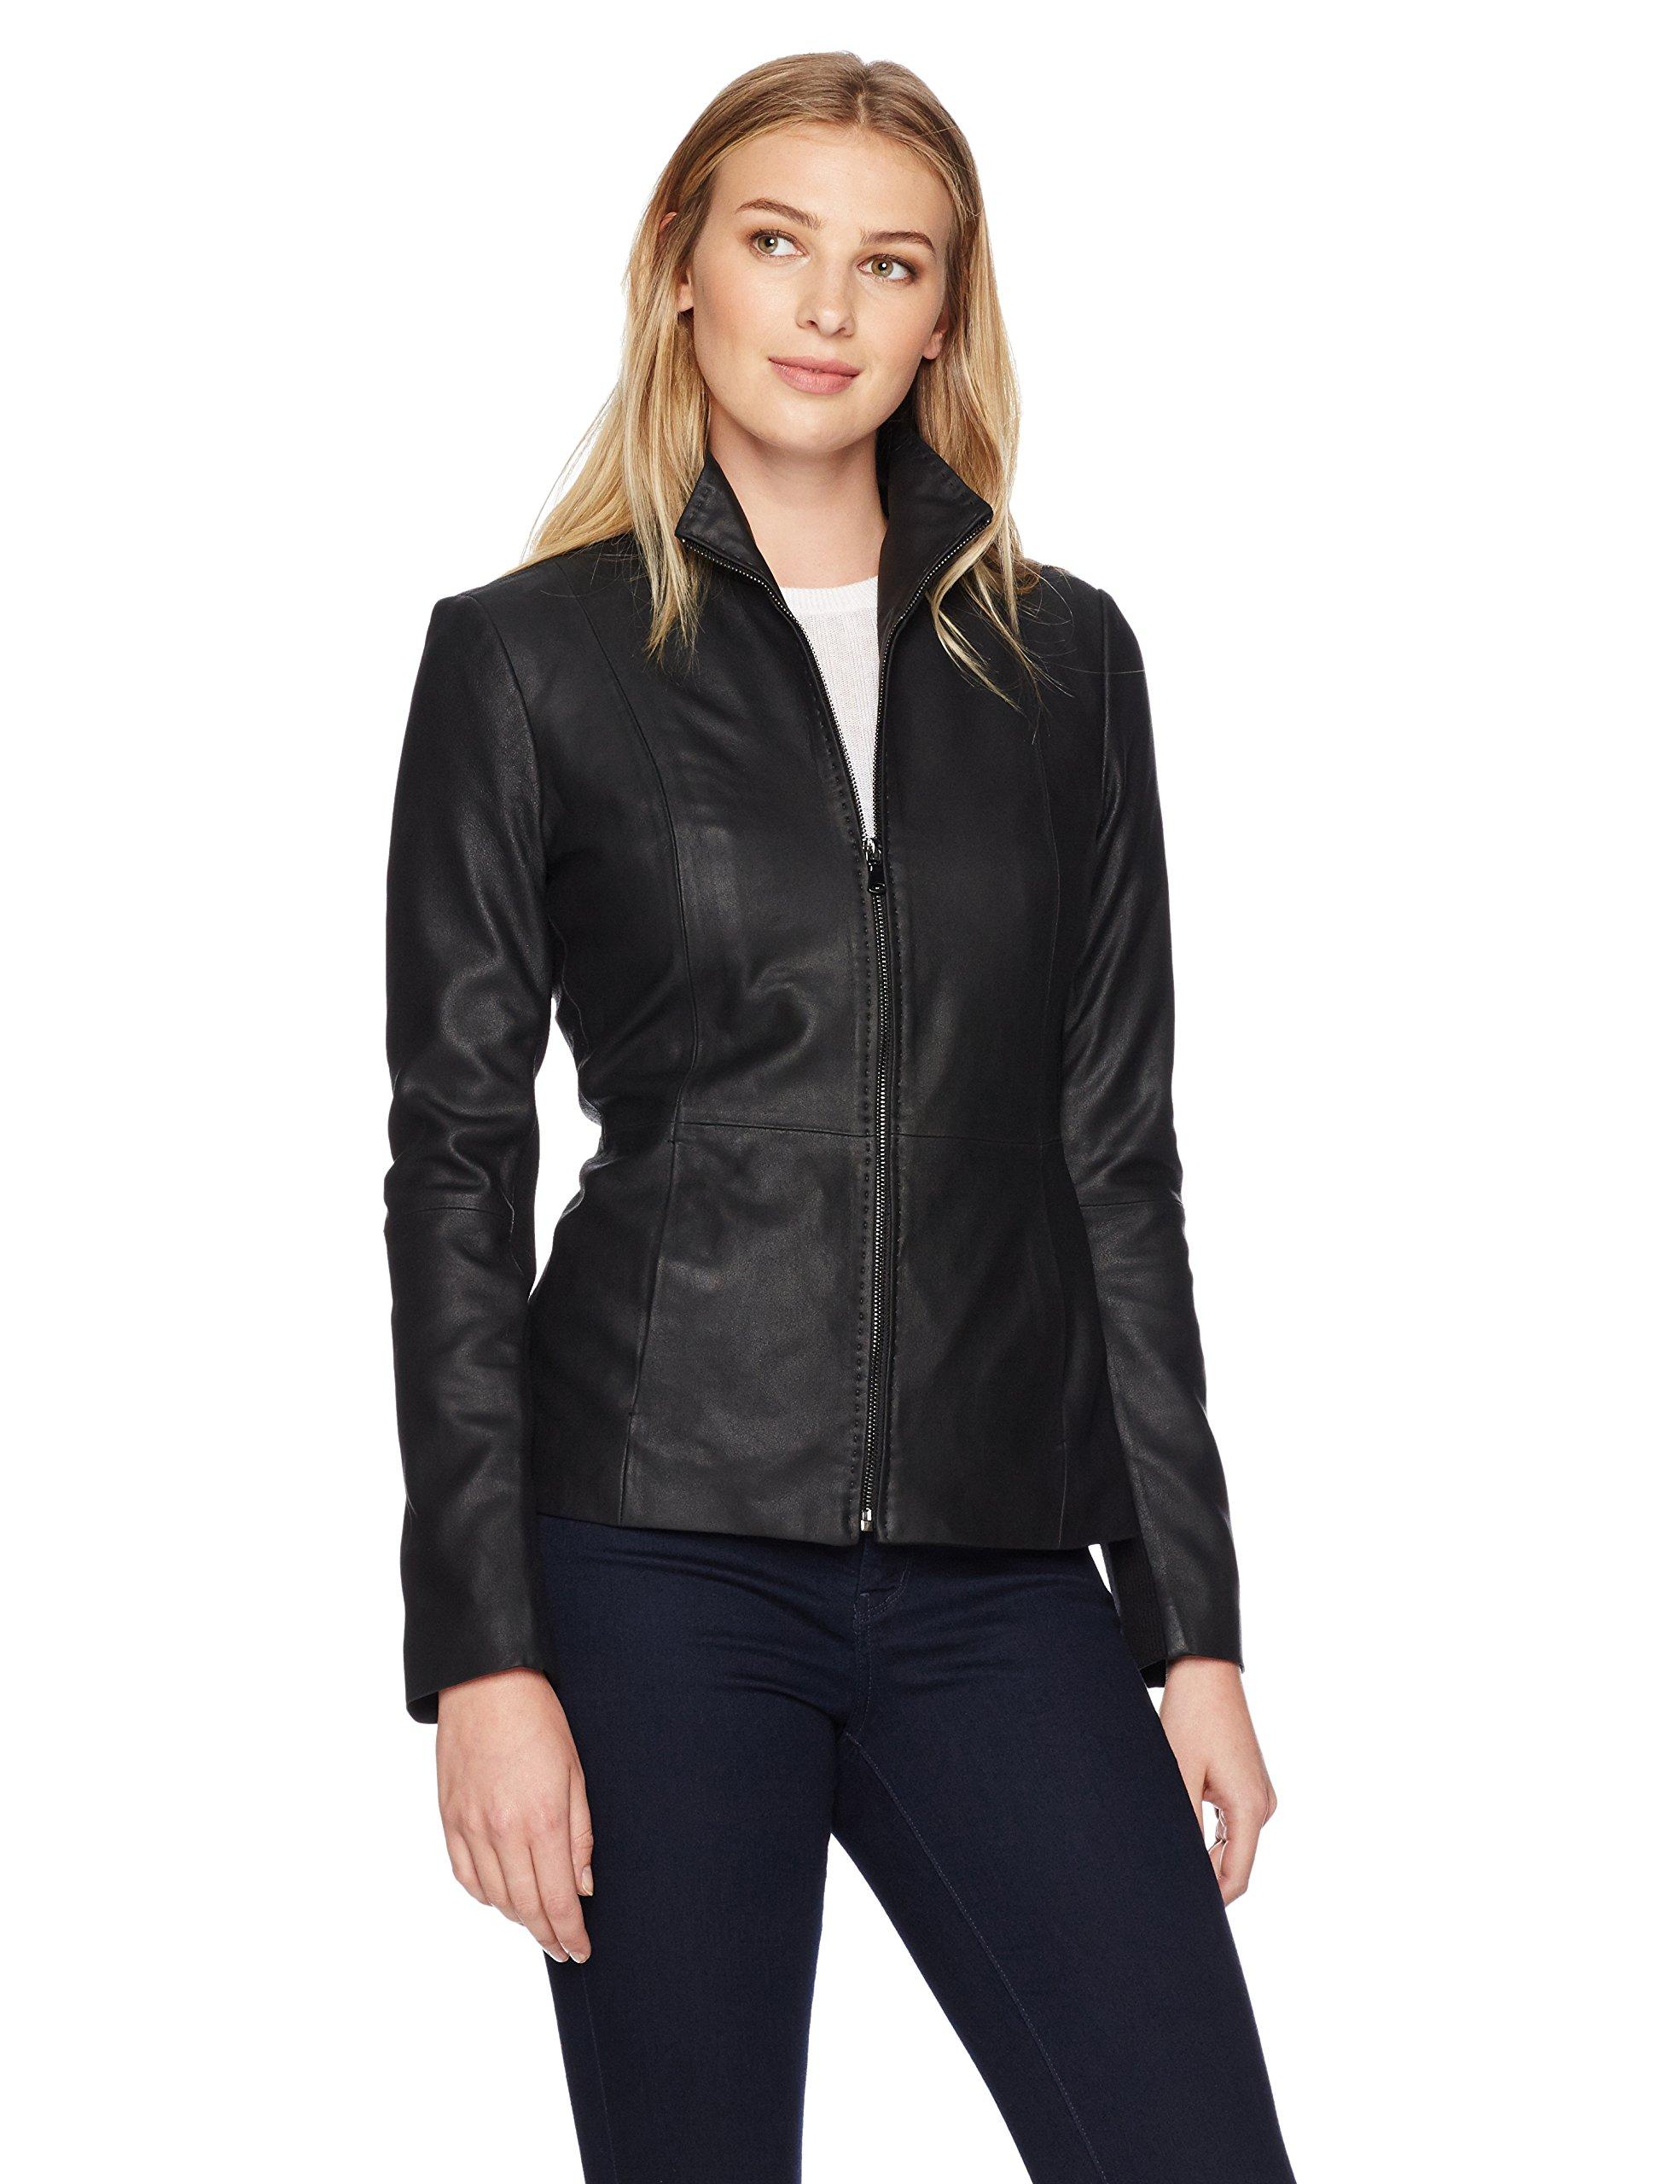 Lark & Ro Women's Scuba Leather Jacket, Black, Medium by Lark & Ro (Image #1)